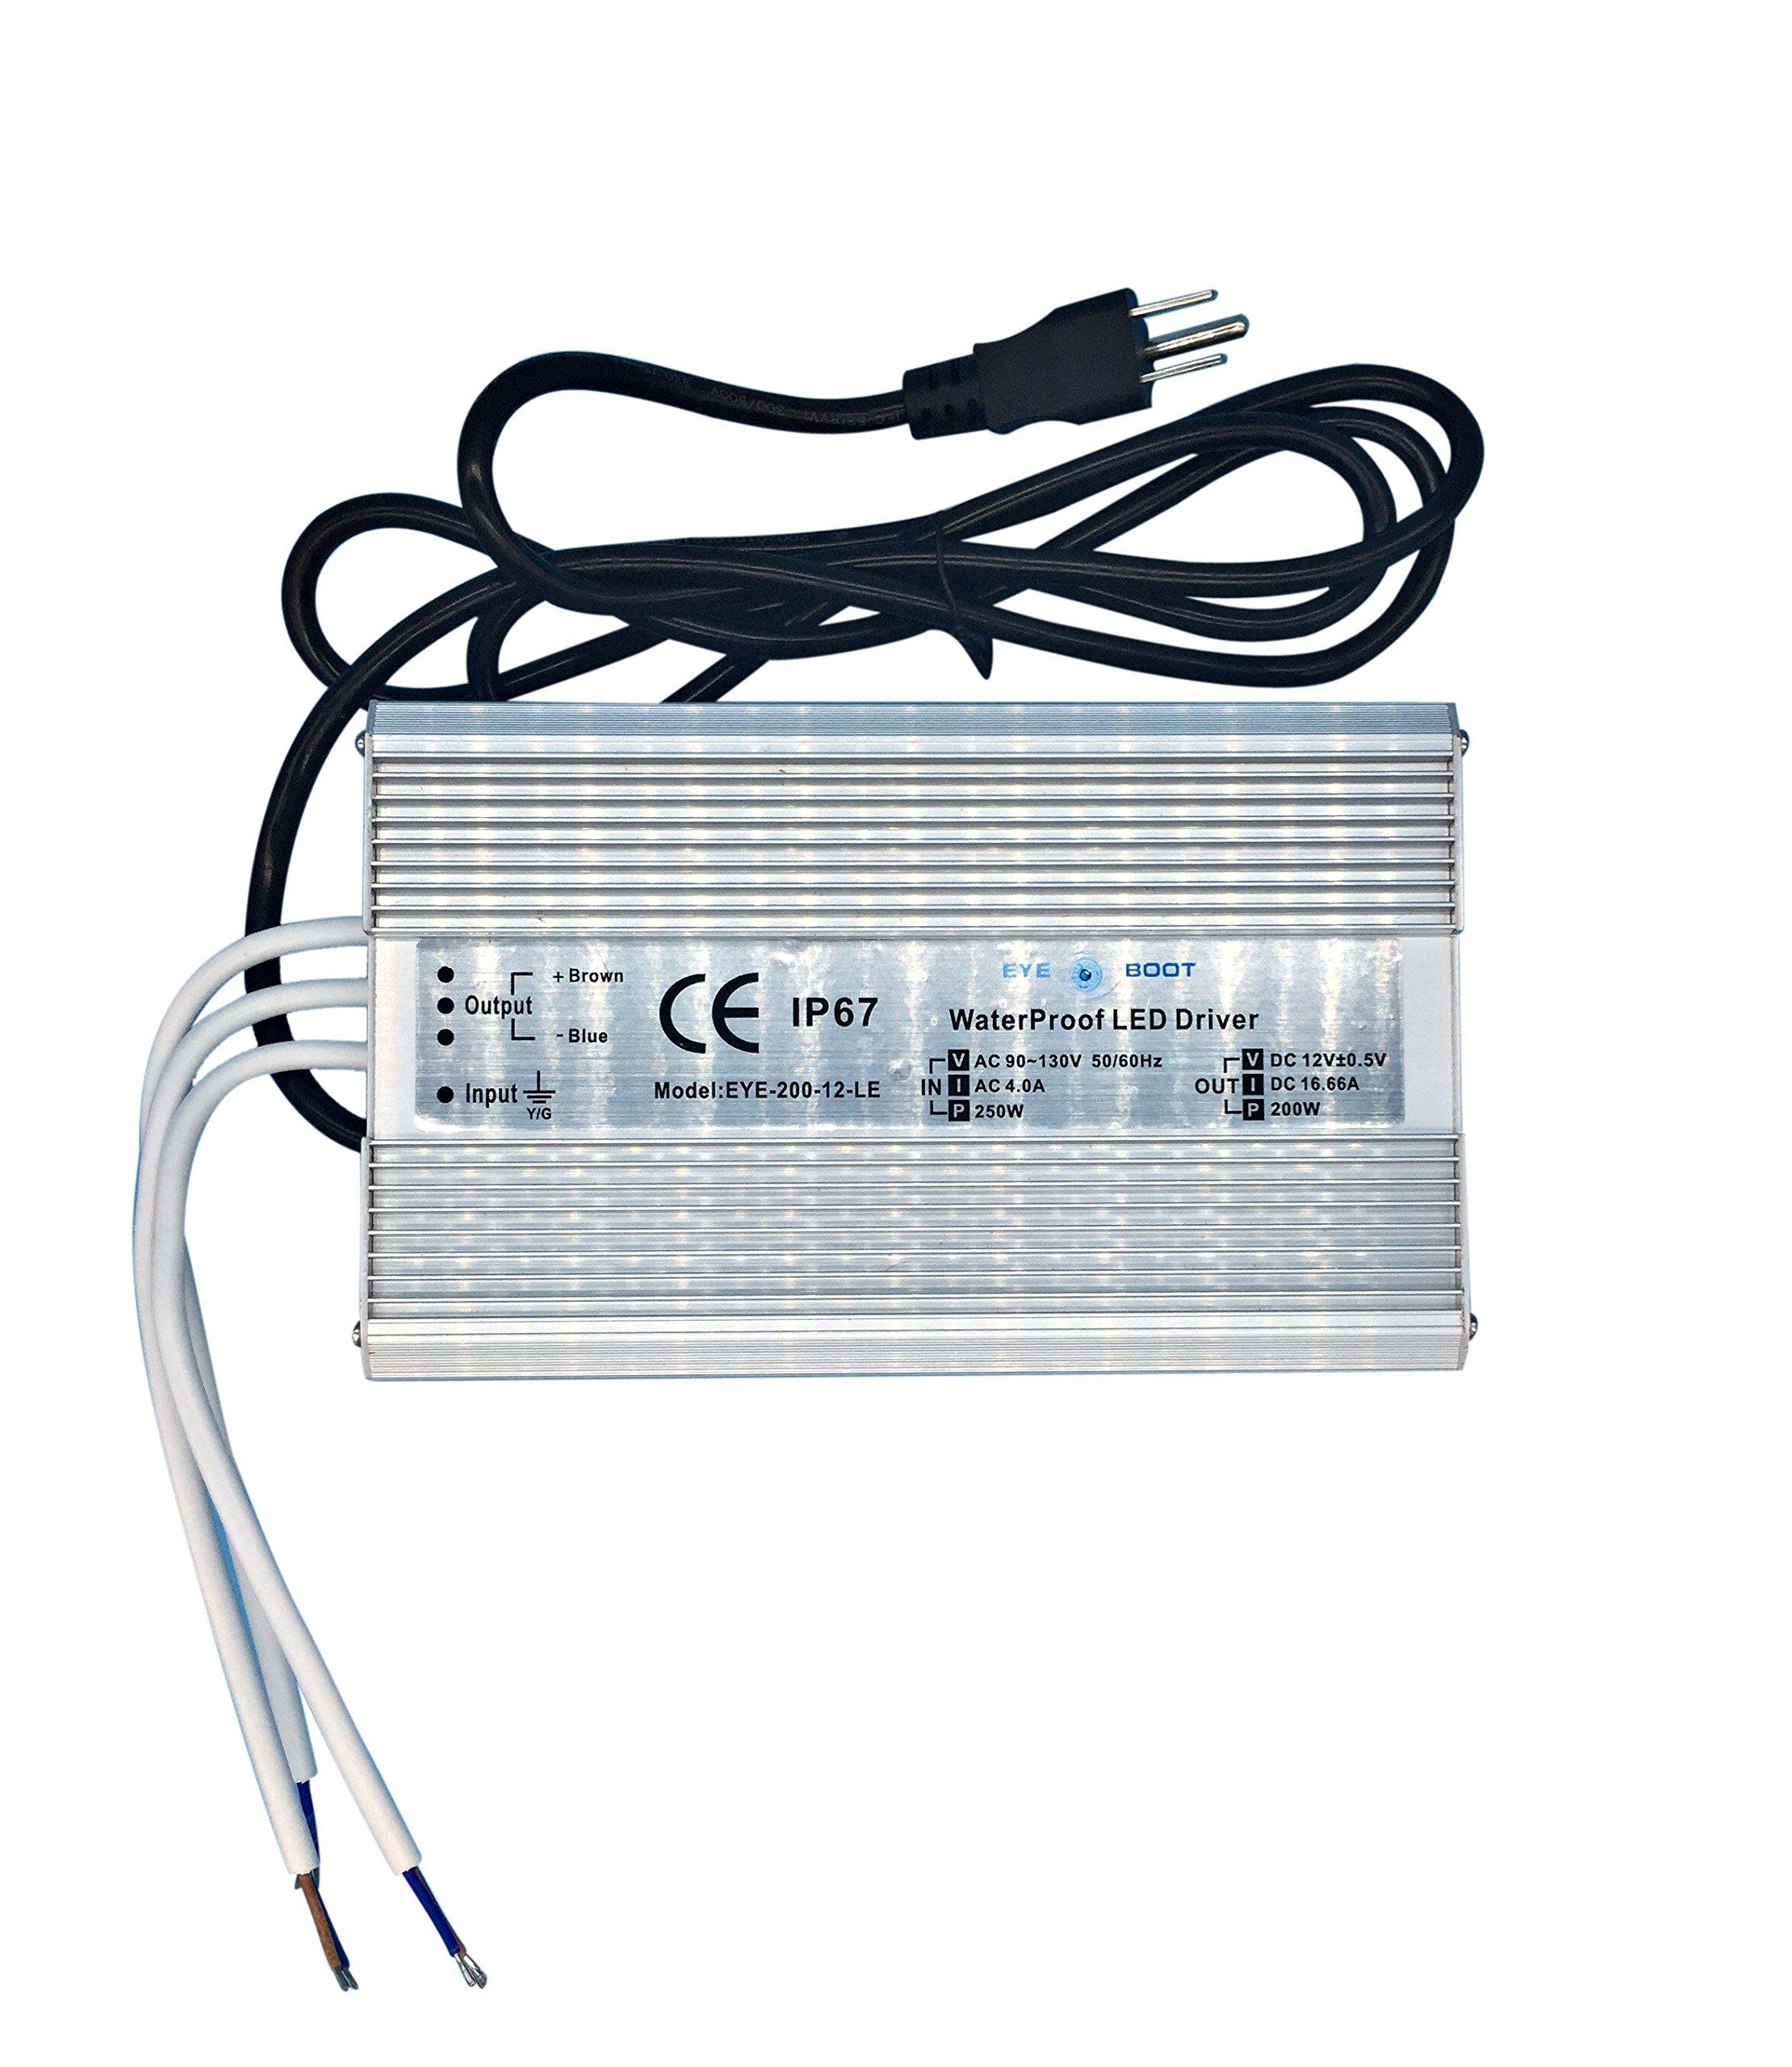 Eyeboot waterproof LED Driver 200 Watt 12 Volt Power Supply with 3-Prong USA Plug, waterproof IP67